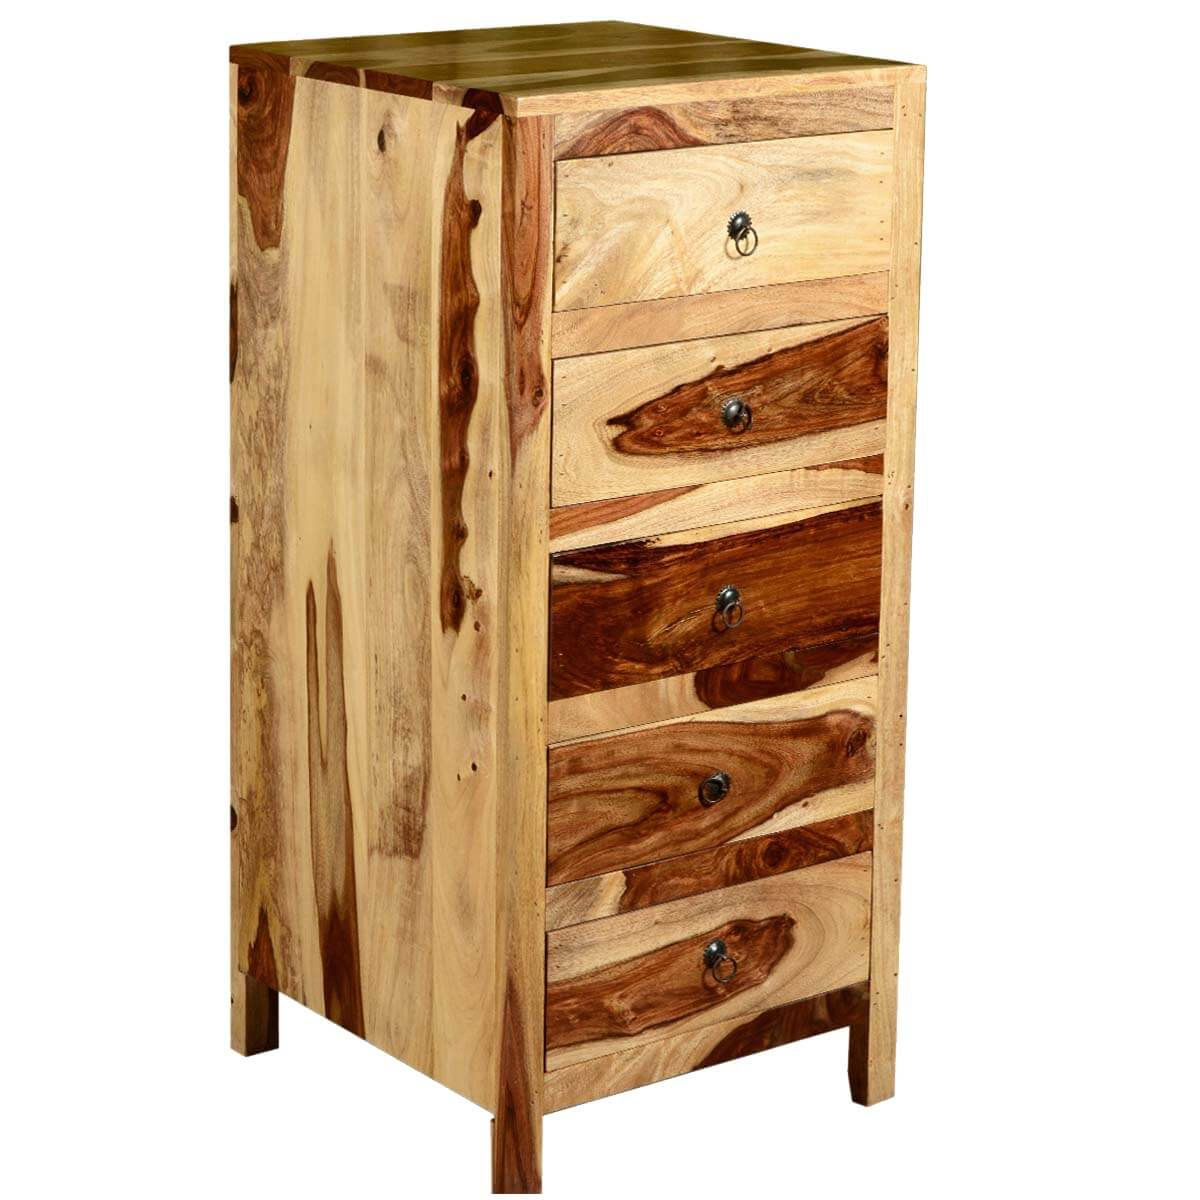 Cheap Modern Furniture Dallas: Dallas Ranch Solid Wood Contemporary 5 Drawer Tower Dresser